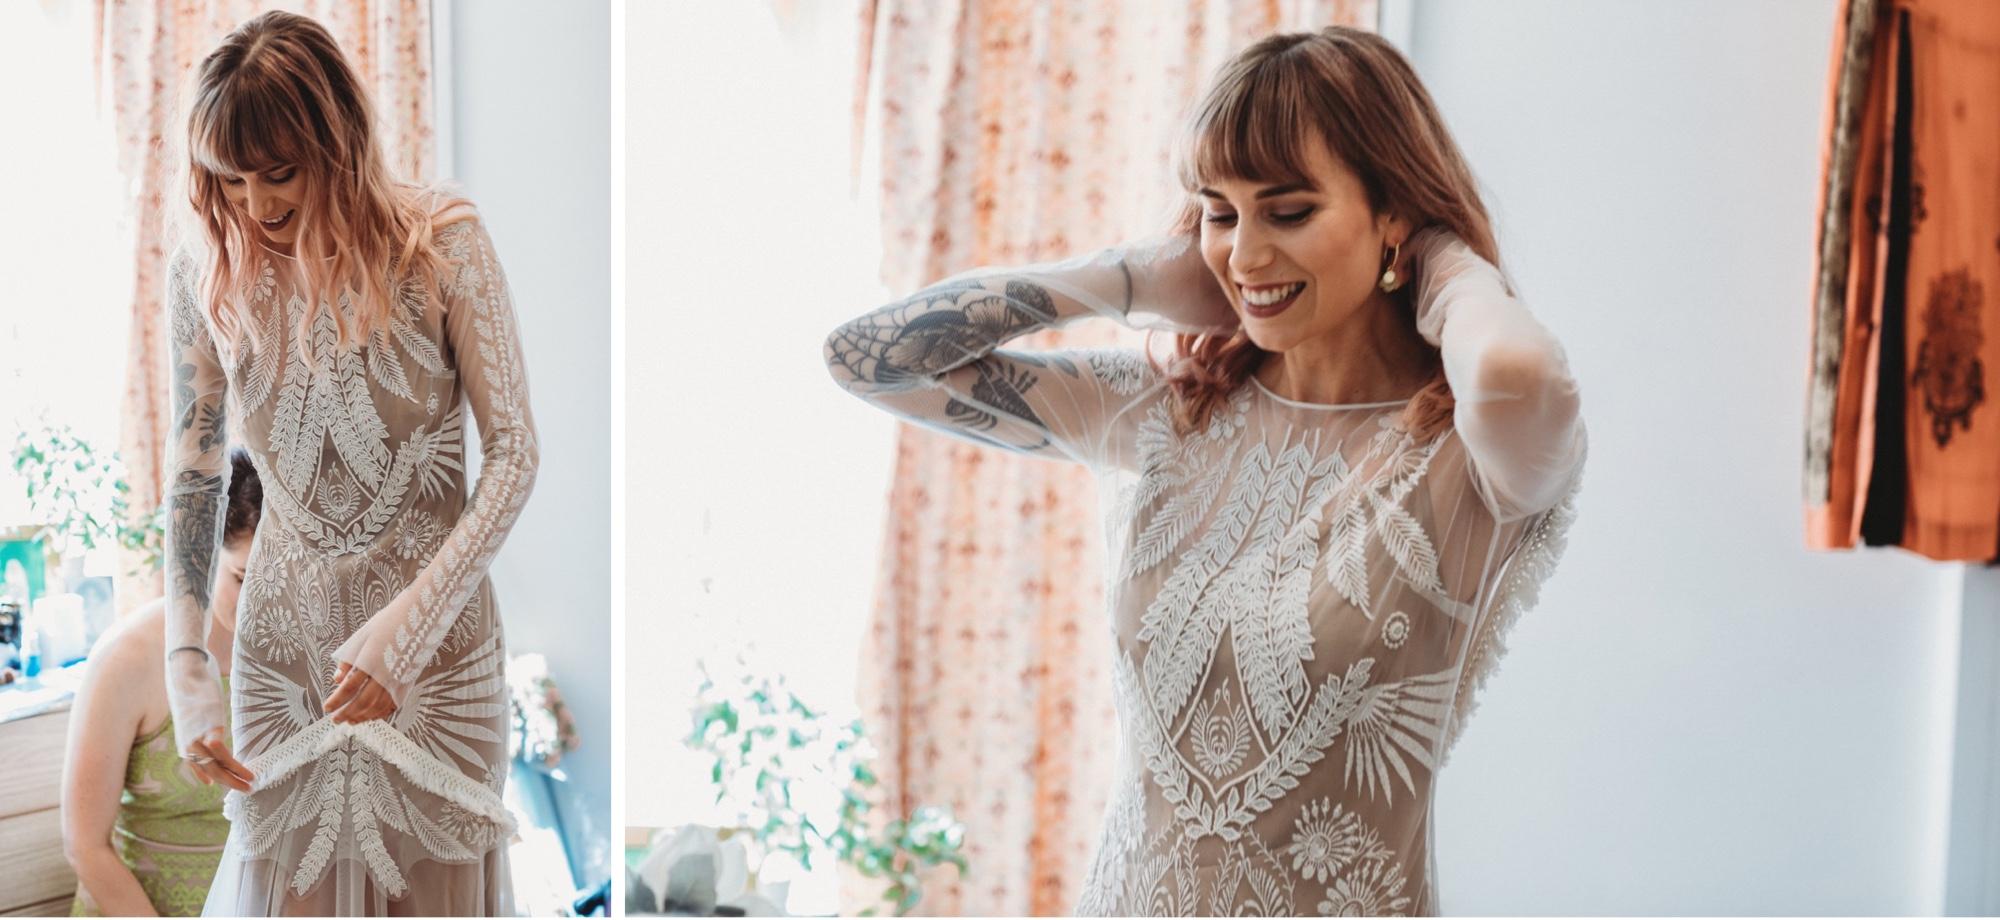 hackney London wedding tattooed bride by zakas photography